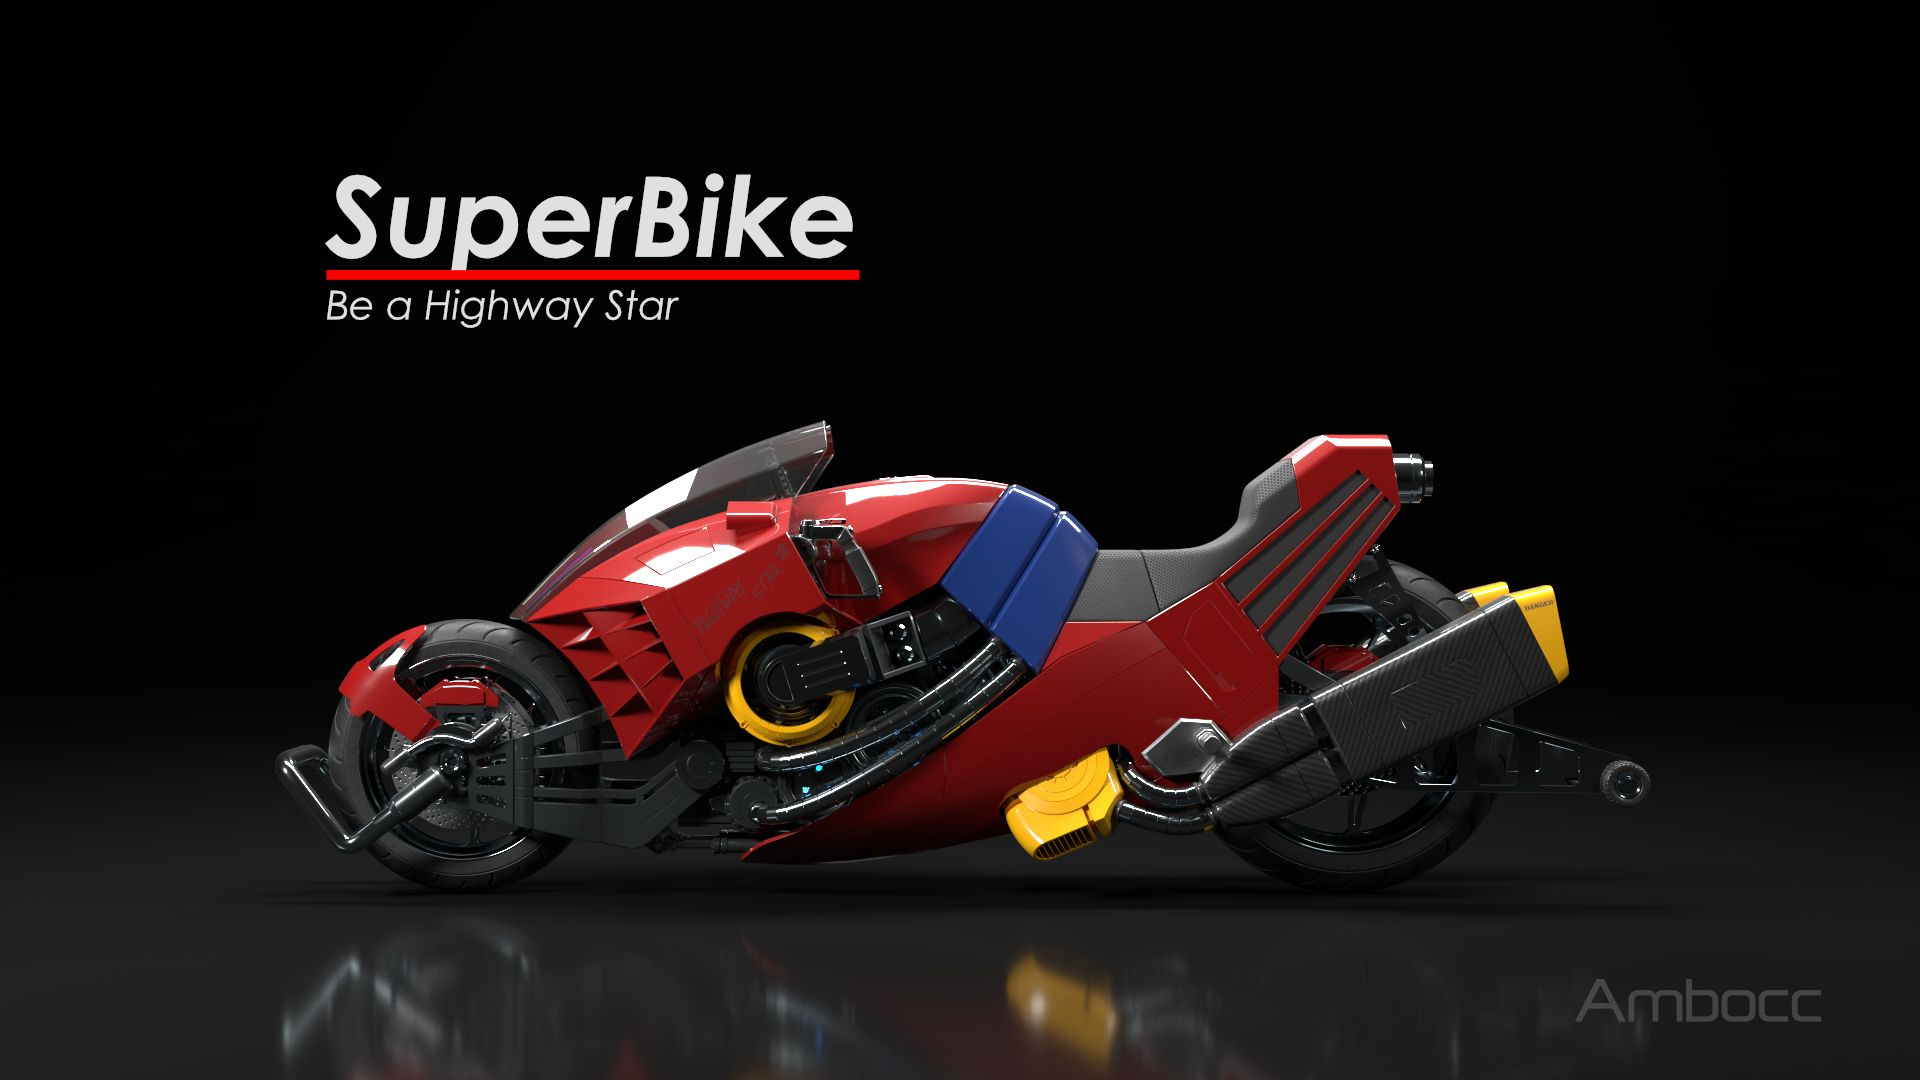 Be a highway star from bubblegum crisis motorcycle cyberpunk bubblegumcrisis superbike anime cg 3d 3dart cgart madewithmodo racing bike suzuki